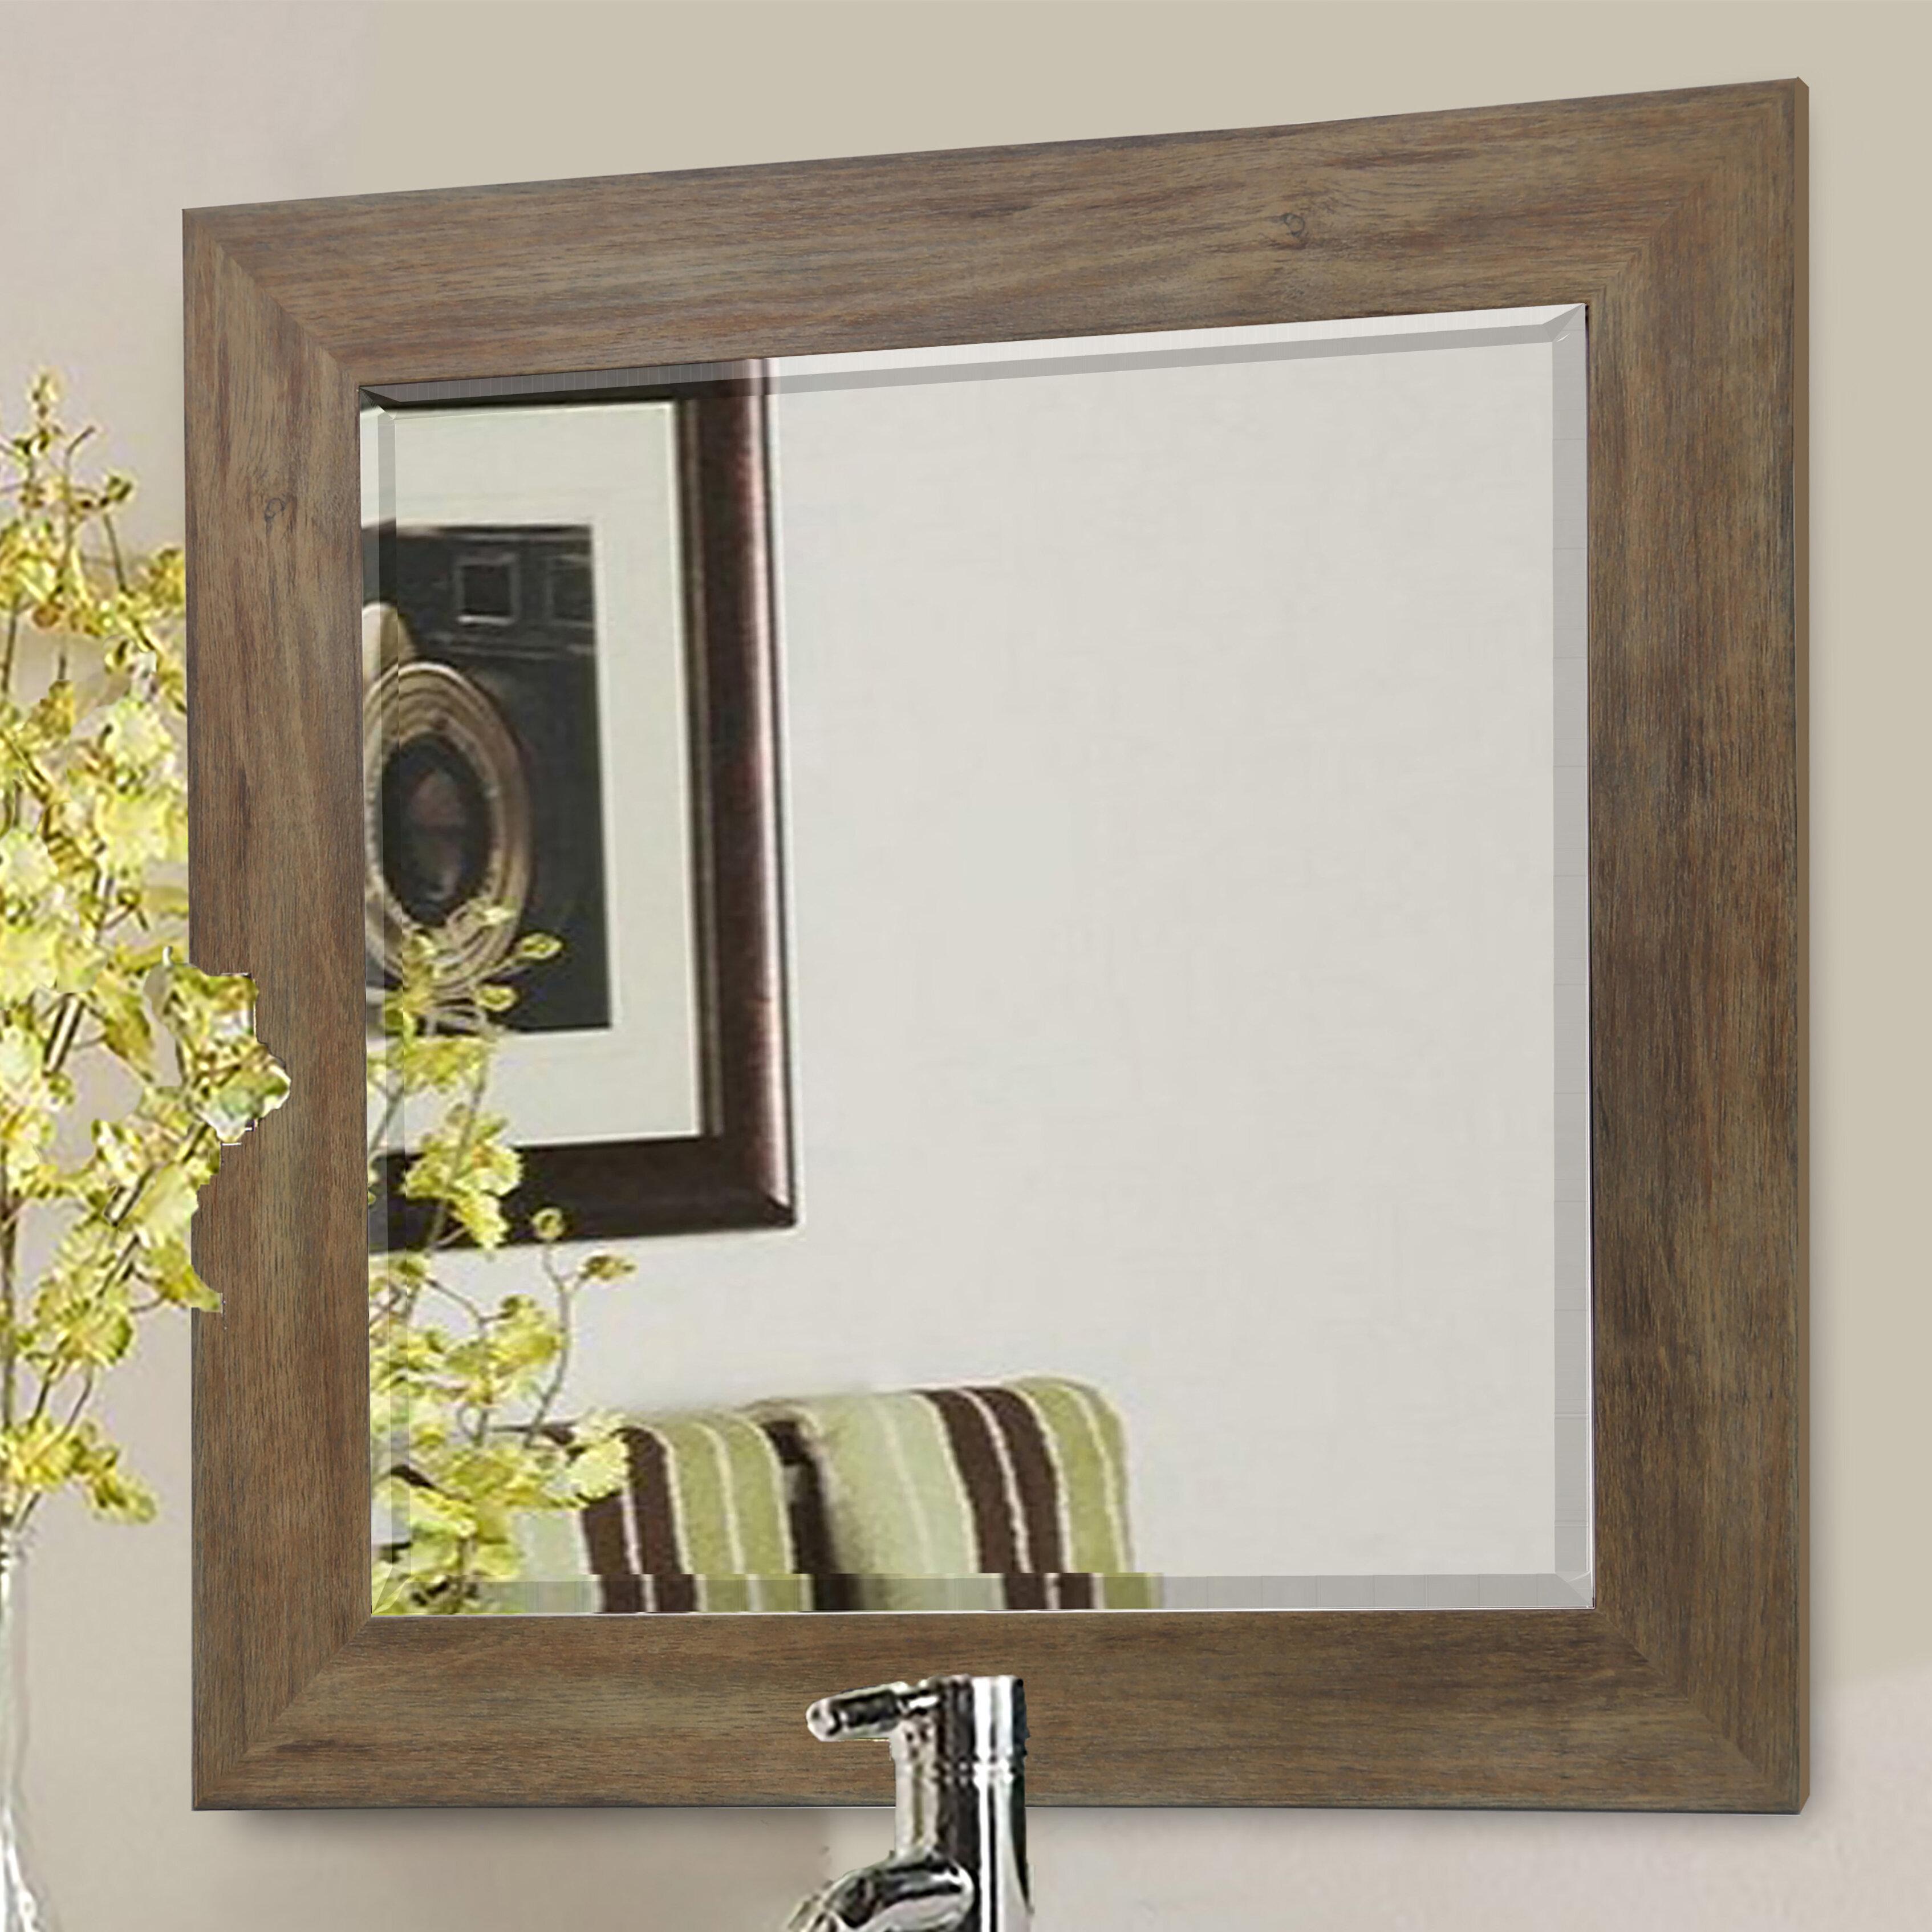 Rayne Mirrors Farmhouse Country Distressed Accent Mirror Wayfair